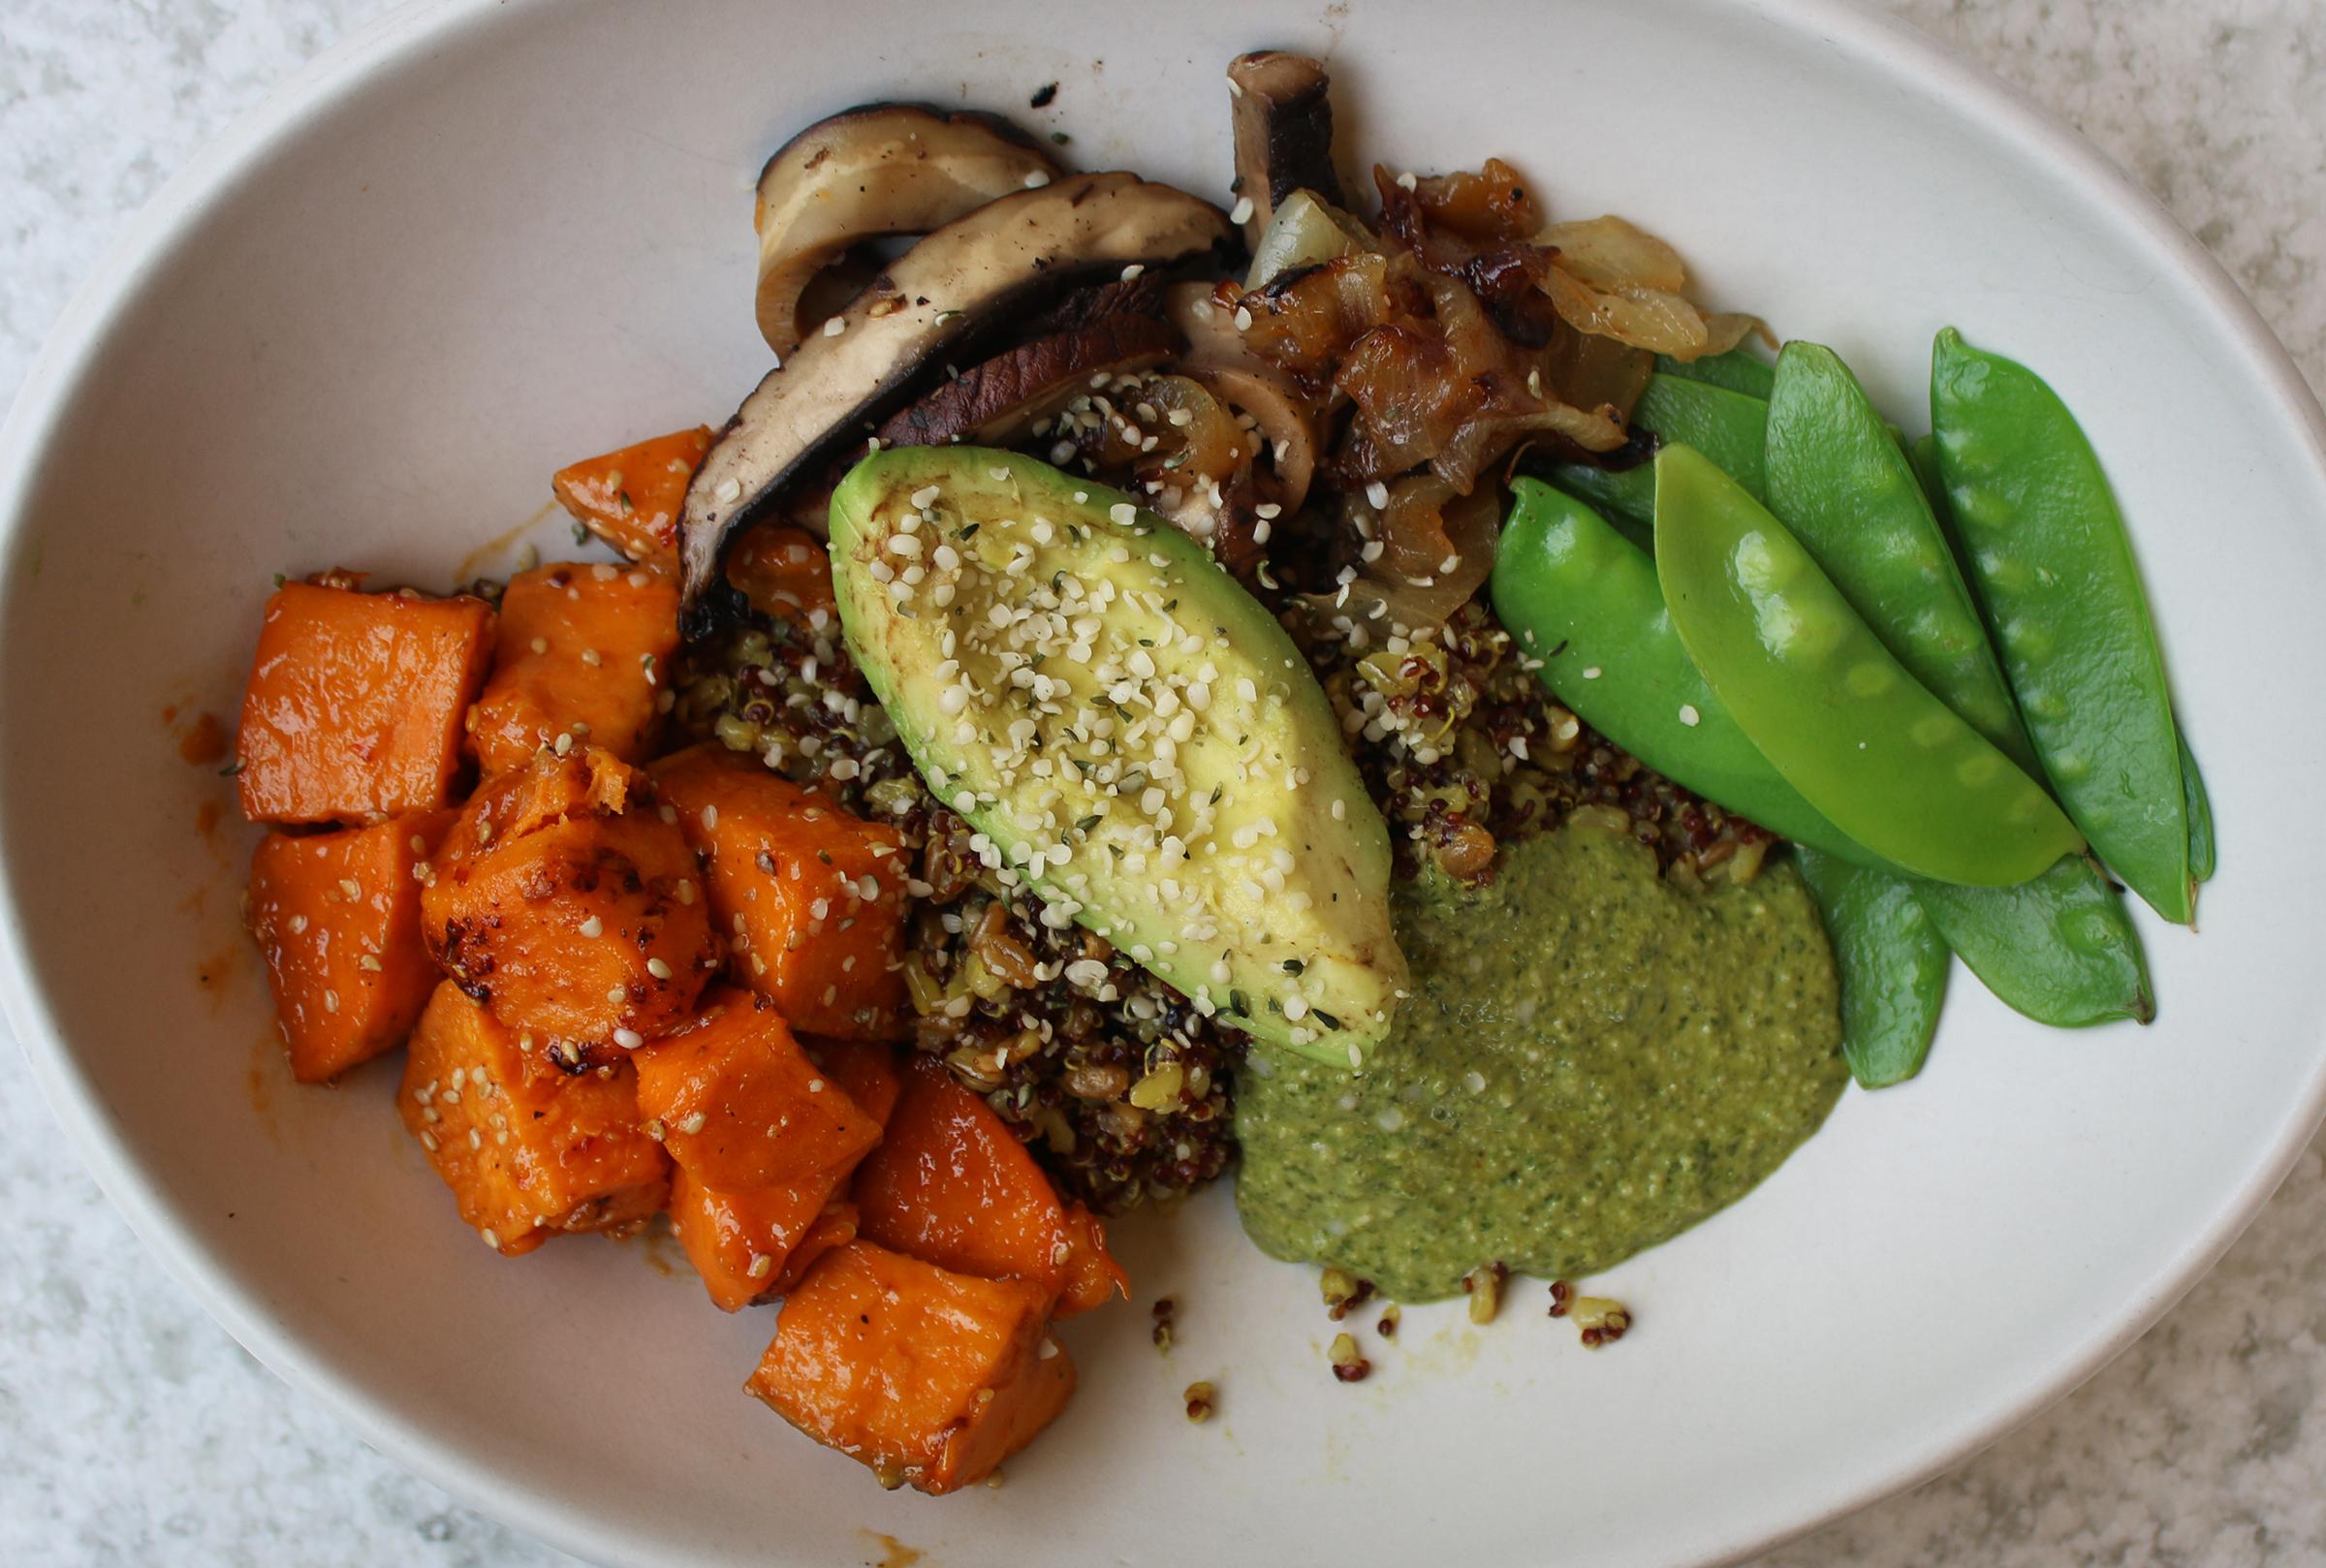 Ancient Grains miso glazed sweet potato, turmeric, charred onion, snow pea, grilled portobello, avocado, hemp seed